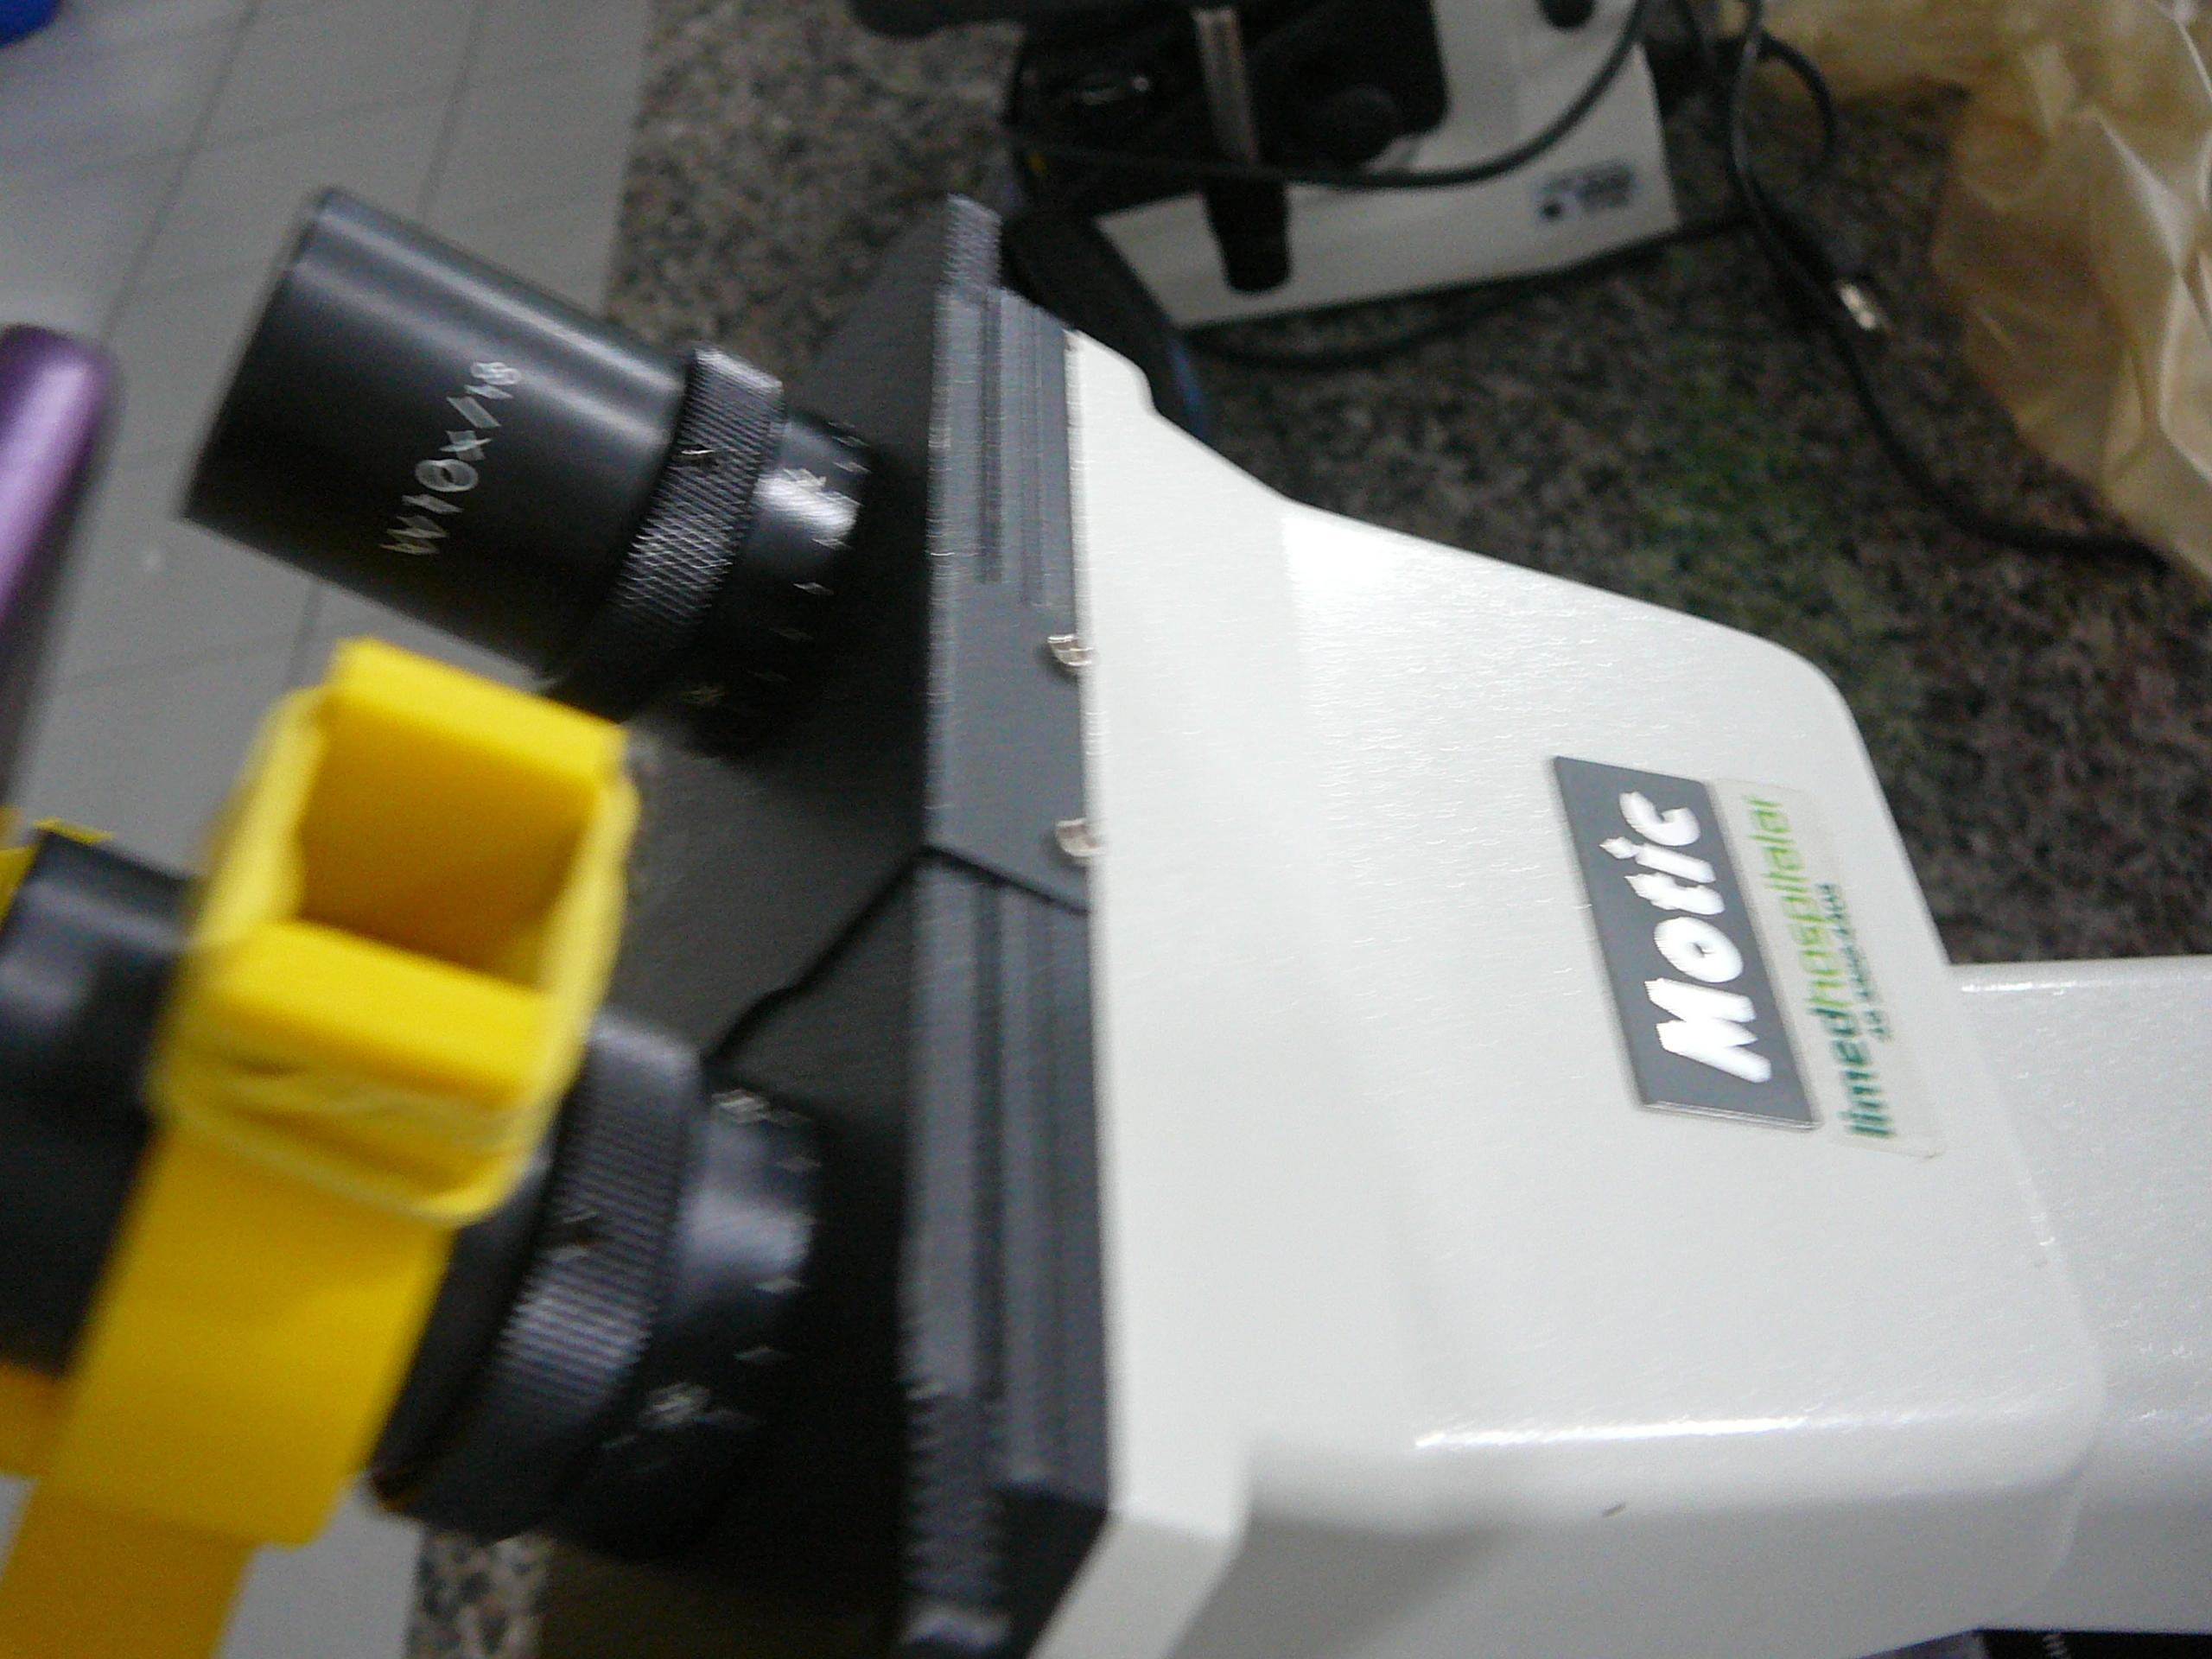 P1080938.JPG Download free STL file Microscope cell support - Suporte de celular para microscópio • 3D printer template, fabiomingori